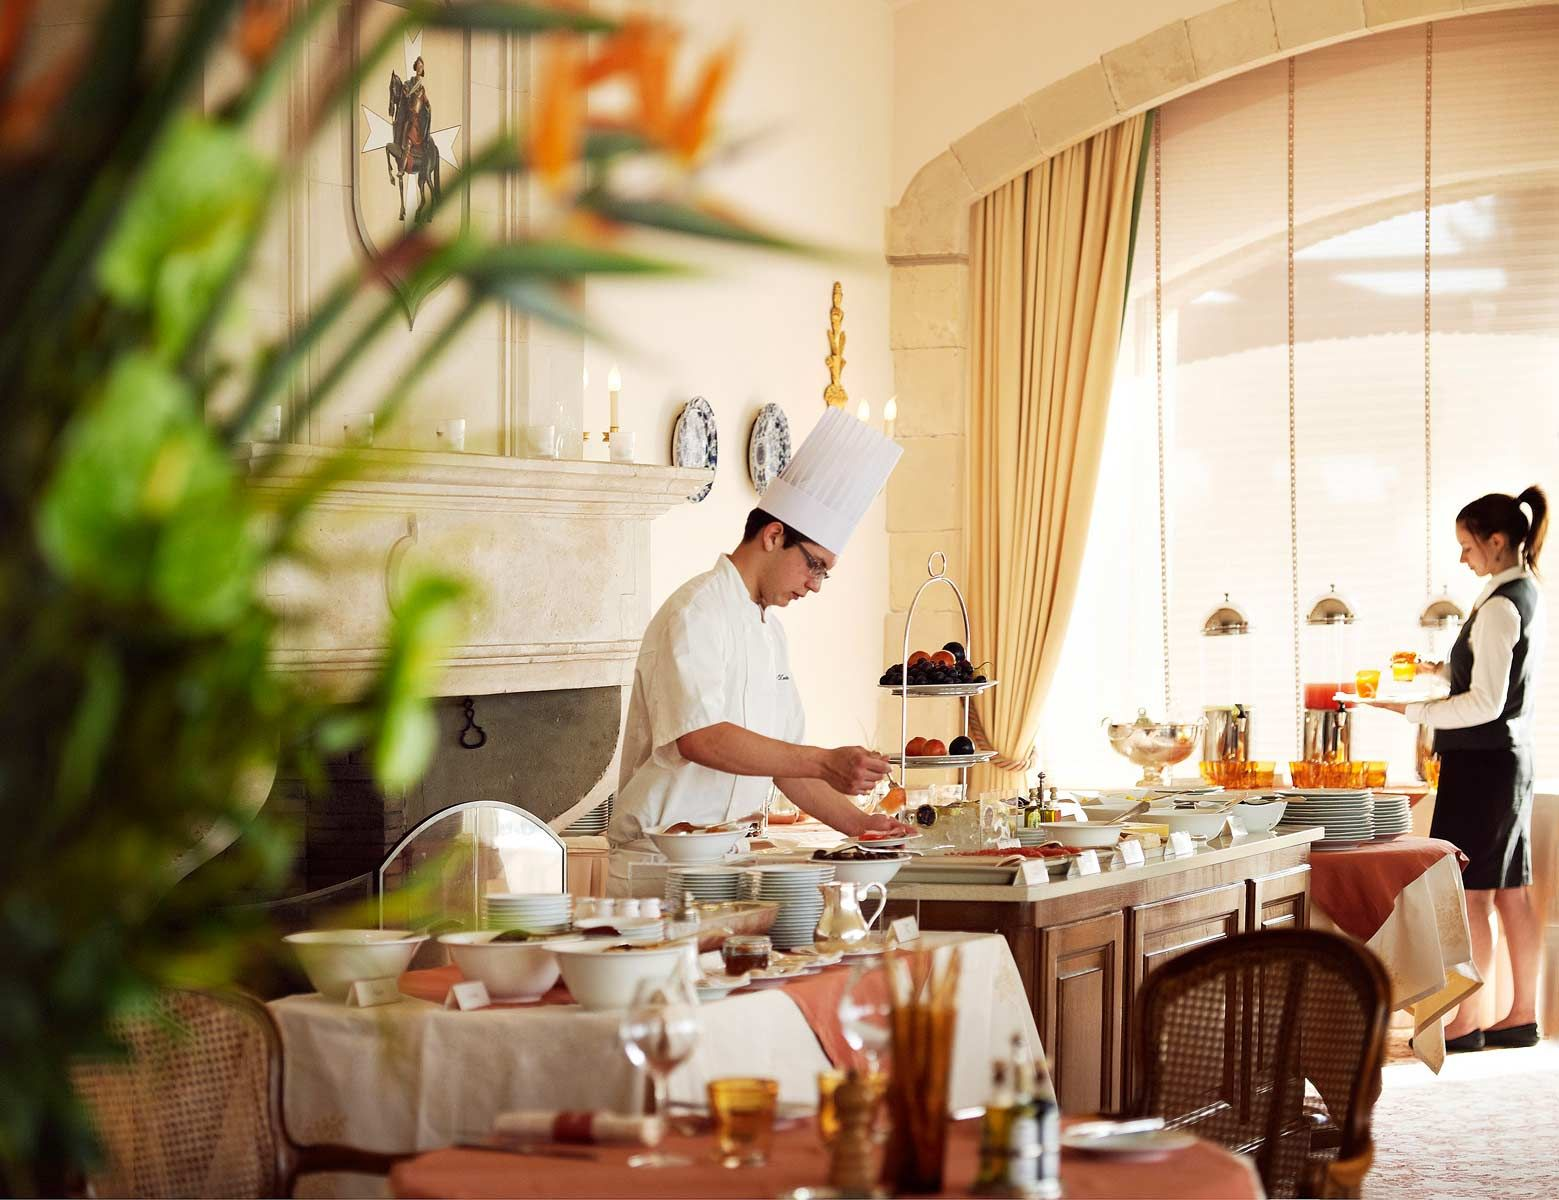 Hotel staff jetsethippie workandtravel 31 people for Spa uniform france